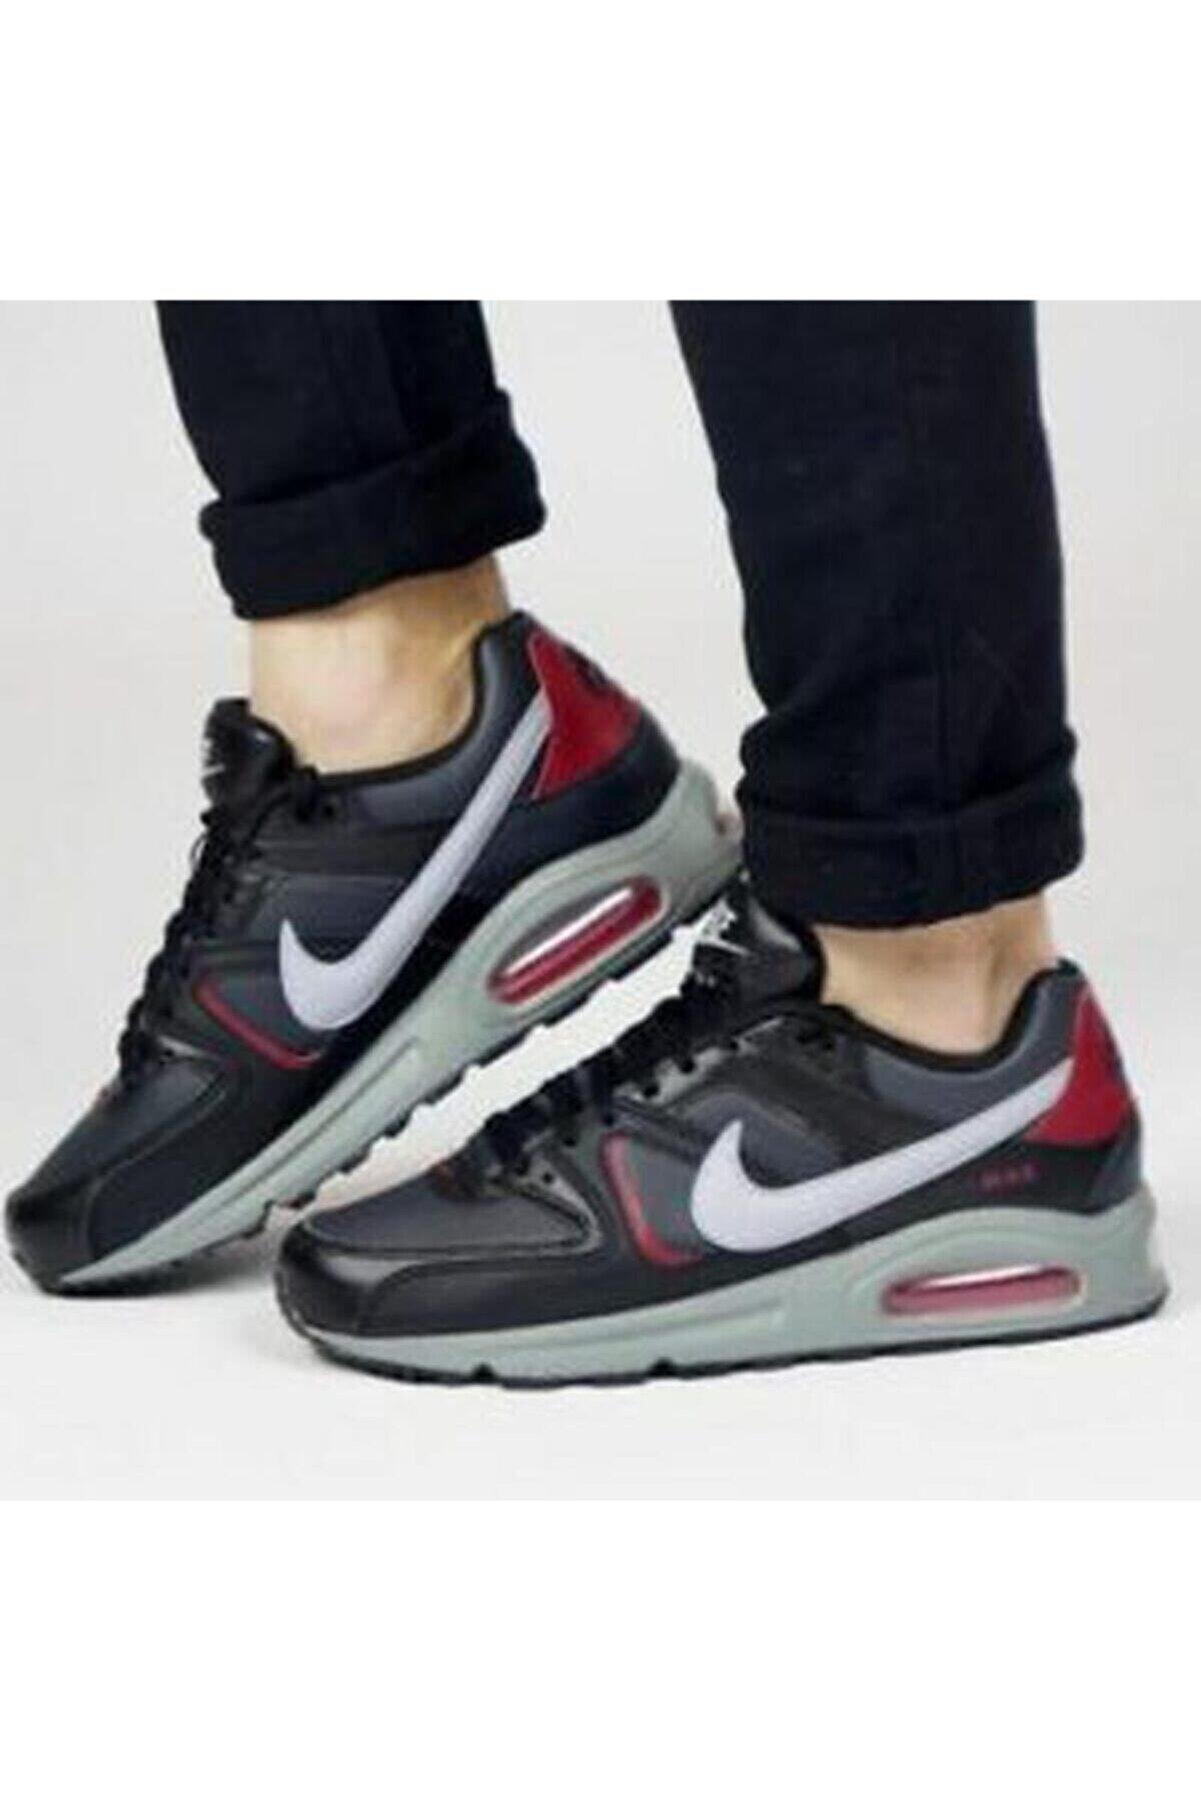 Nike Cd0873-001 Aır Max Command Unısex Günlük Yürüyüş